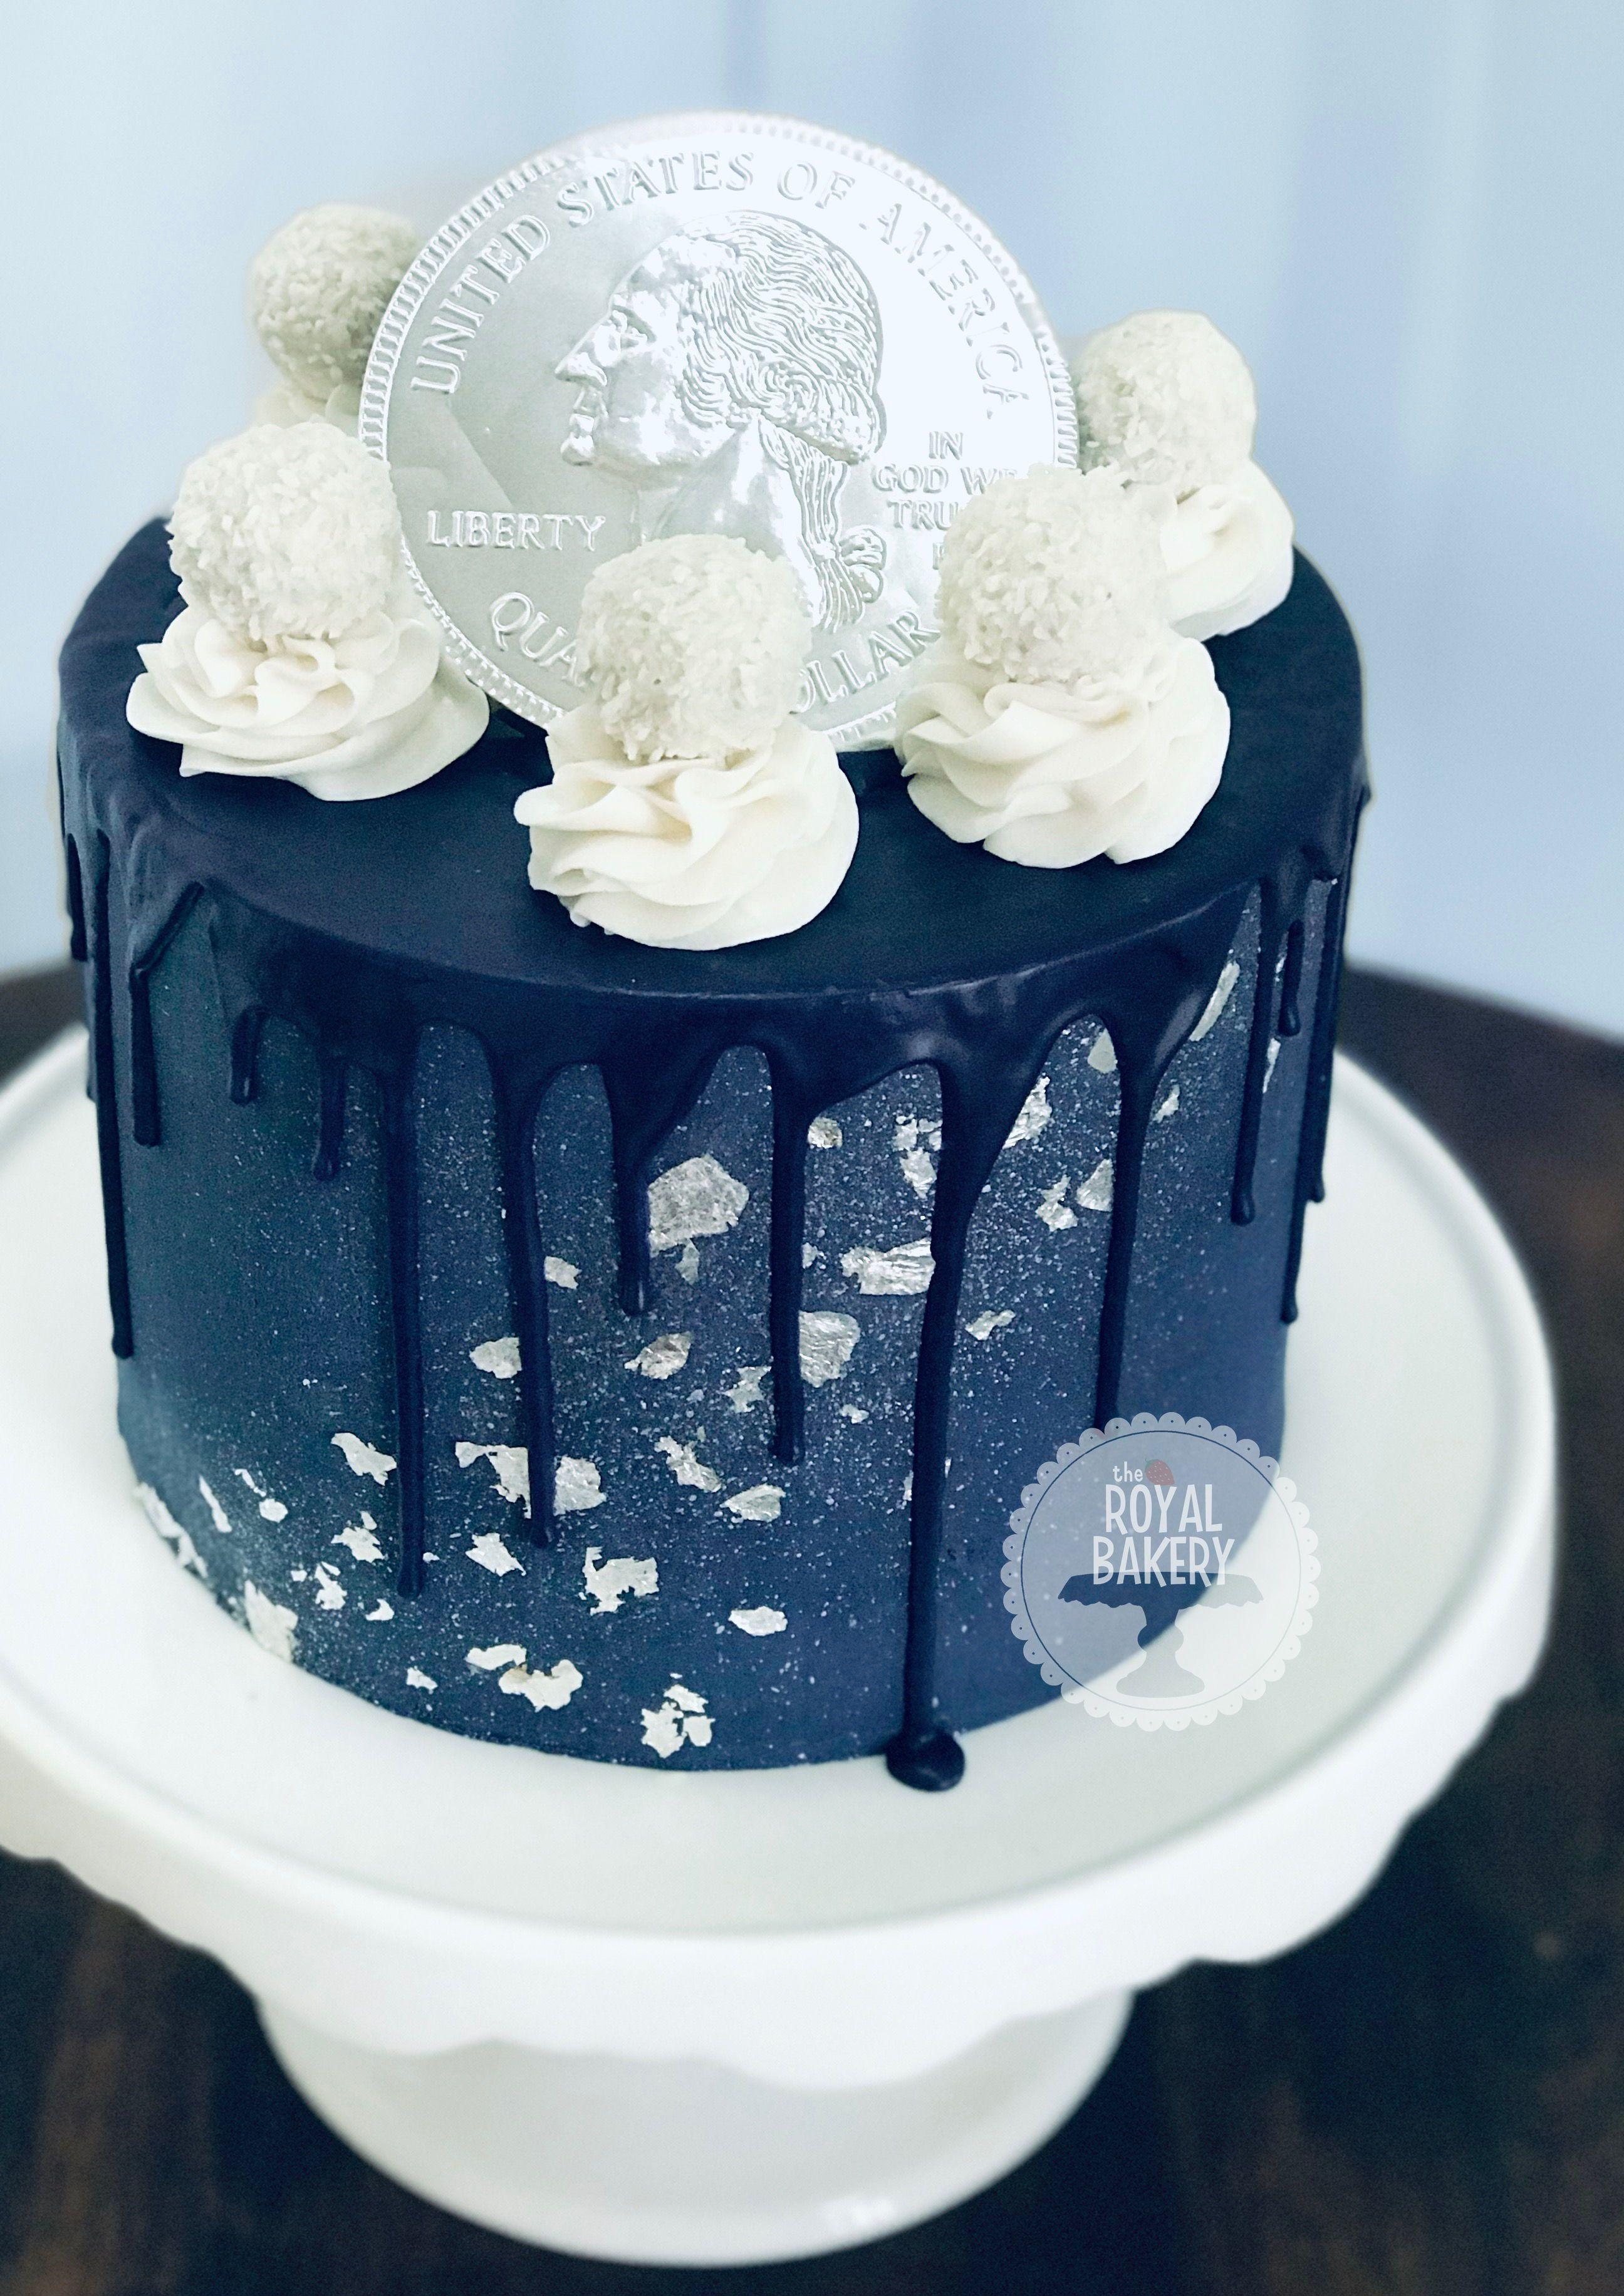 Marvelous Navy Blue Hanukkah Drip Cake Blue Birthday Cakes Blue Drip Cake Birthday Cards Printable Inklcafe Filternl